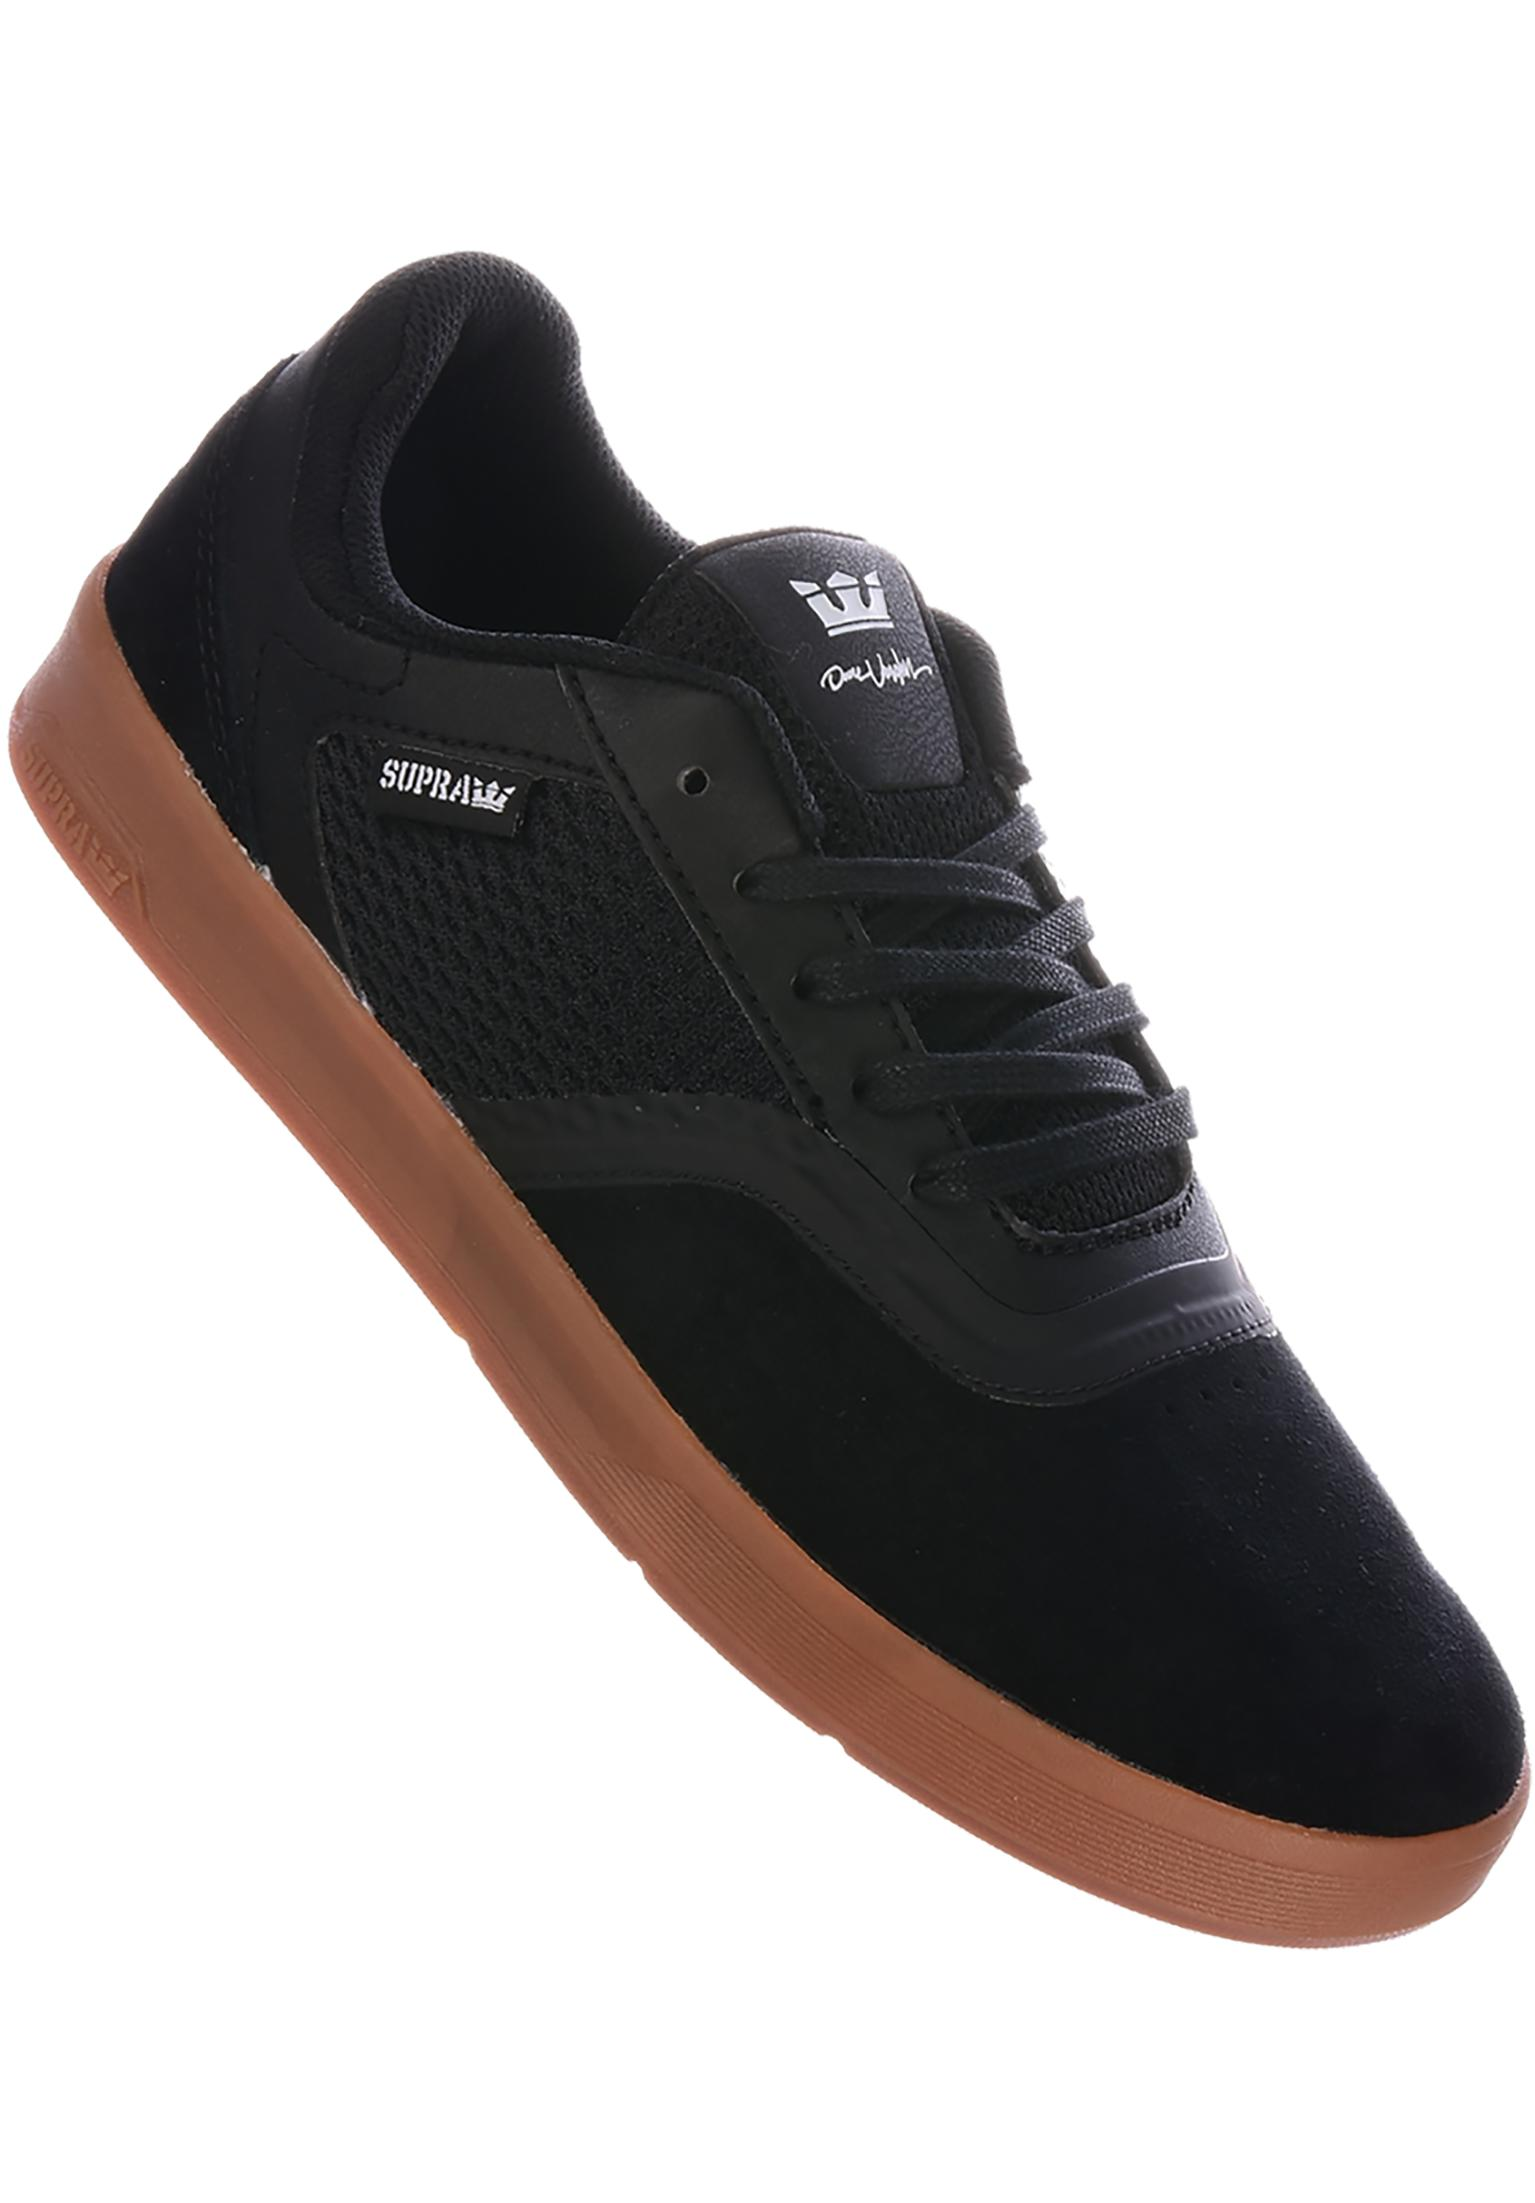 Saint Supra All Shoes in black-gum for Men  65a06ee6b1